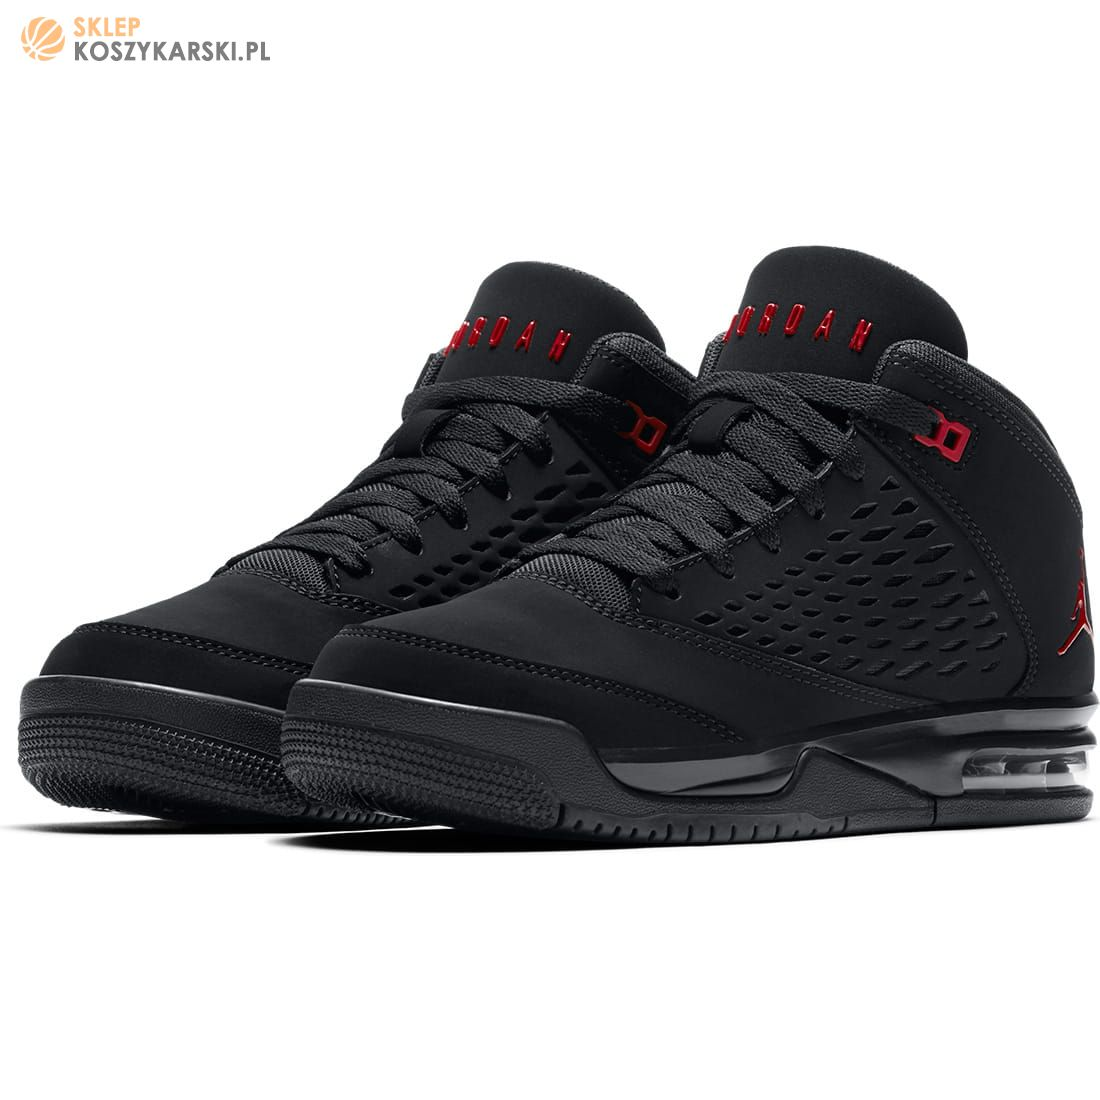 1ed4990f Buty do koszykówki Jordan Flight Origin 4 GS Black (921201-002 ...